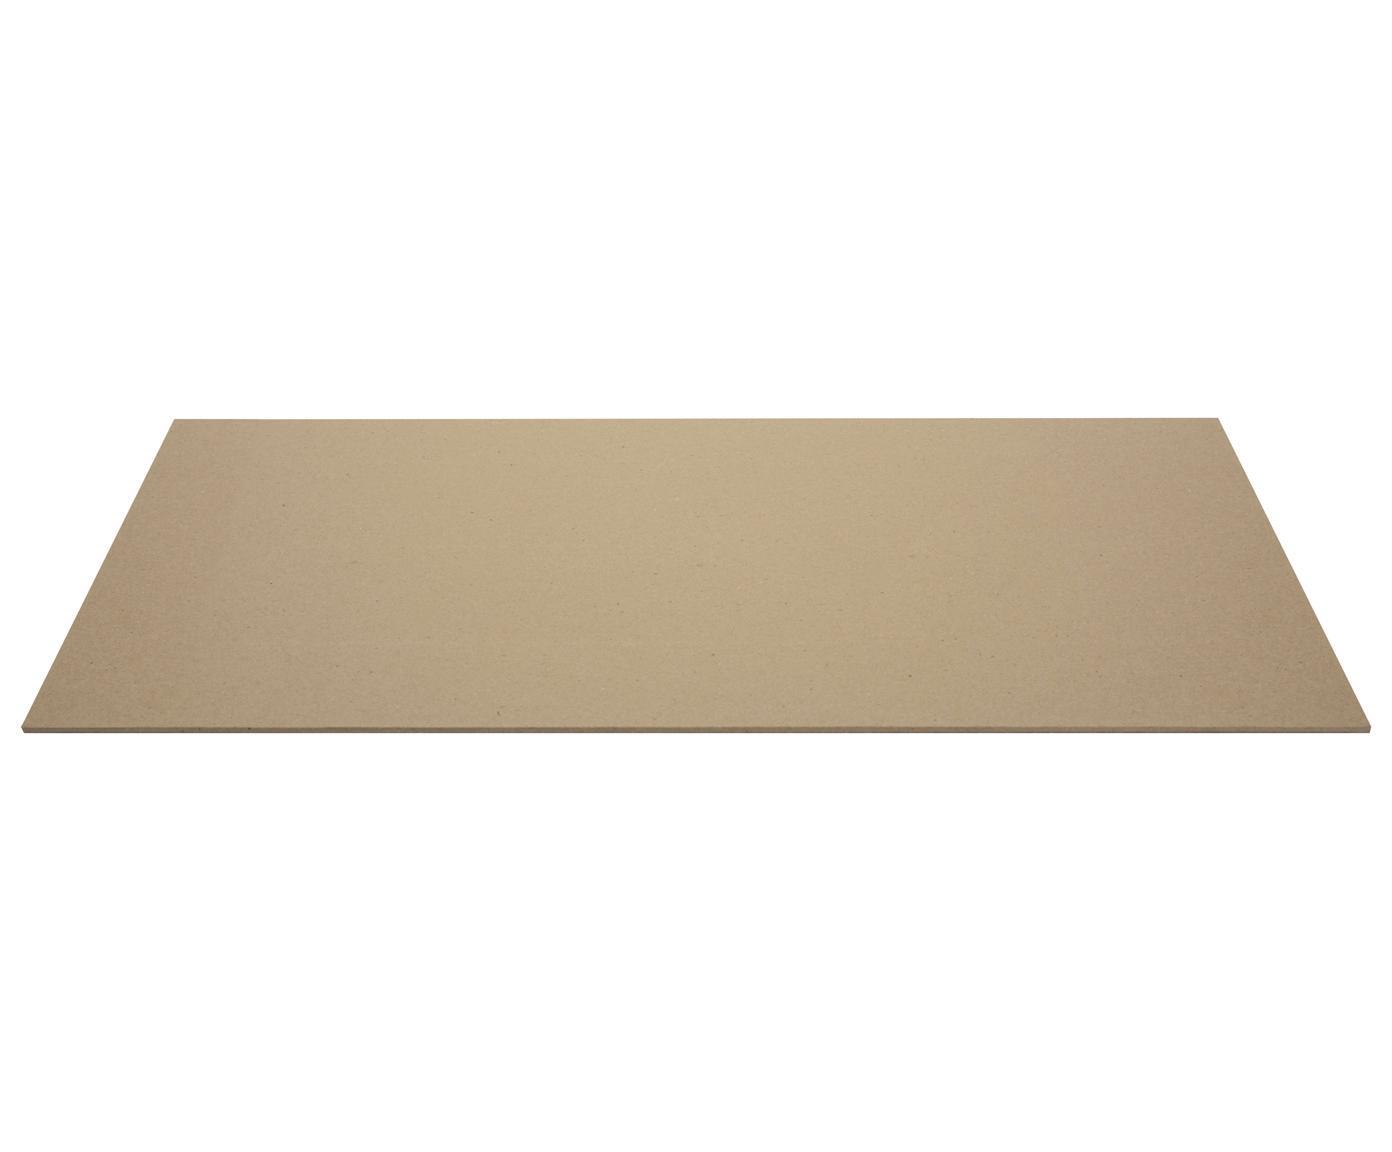 Bureaumat Annie, Stevig, gelamineerd karton, Lichtbruin, B 59 x D 39 cm